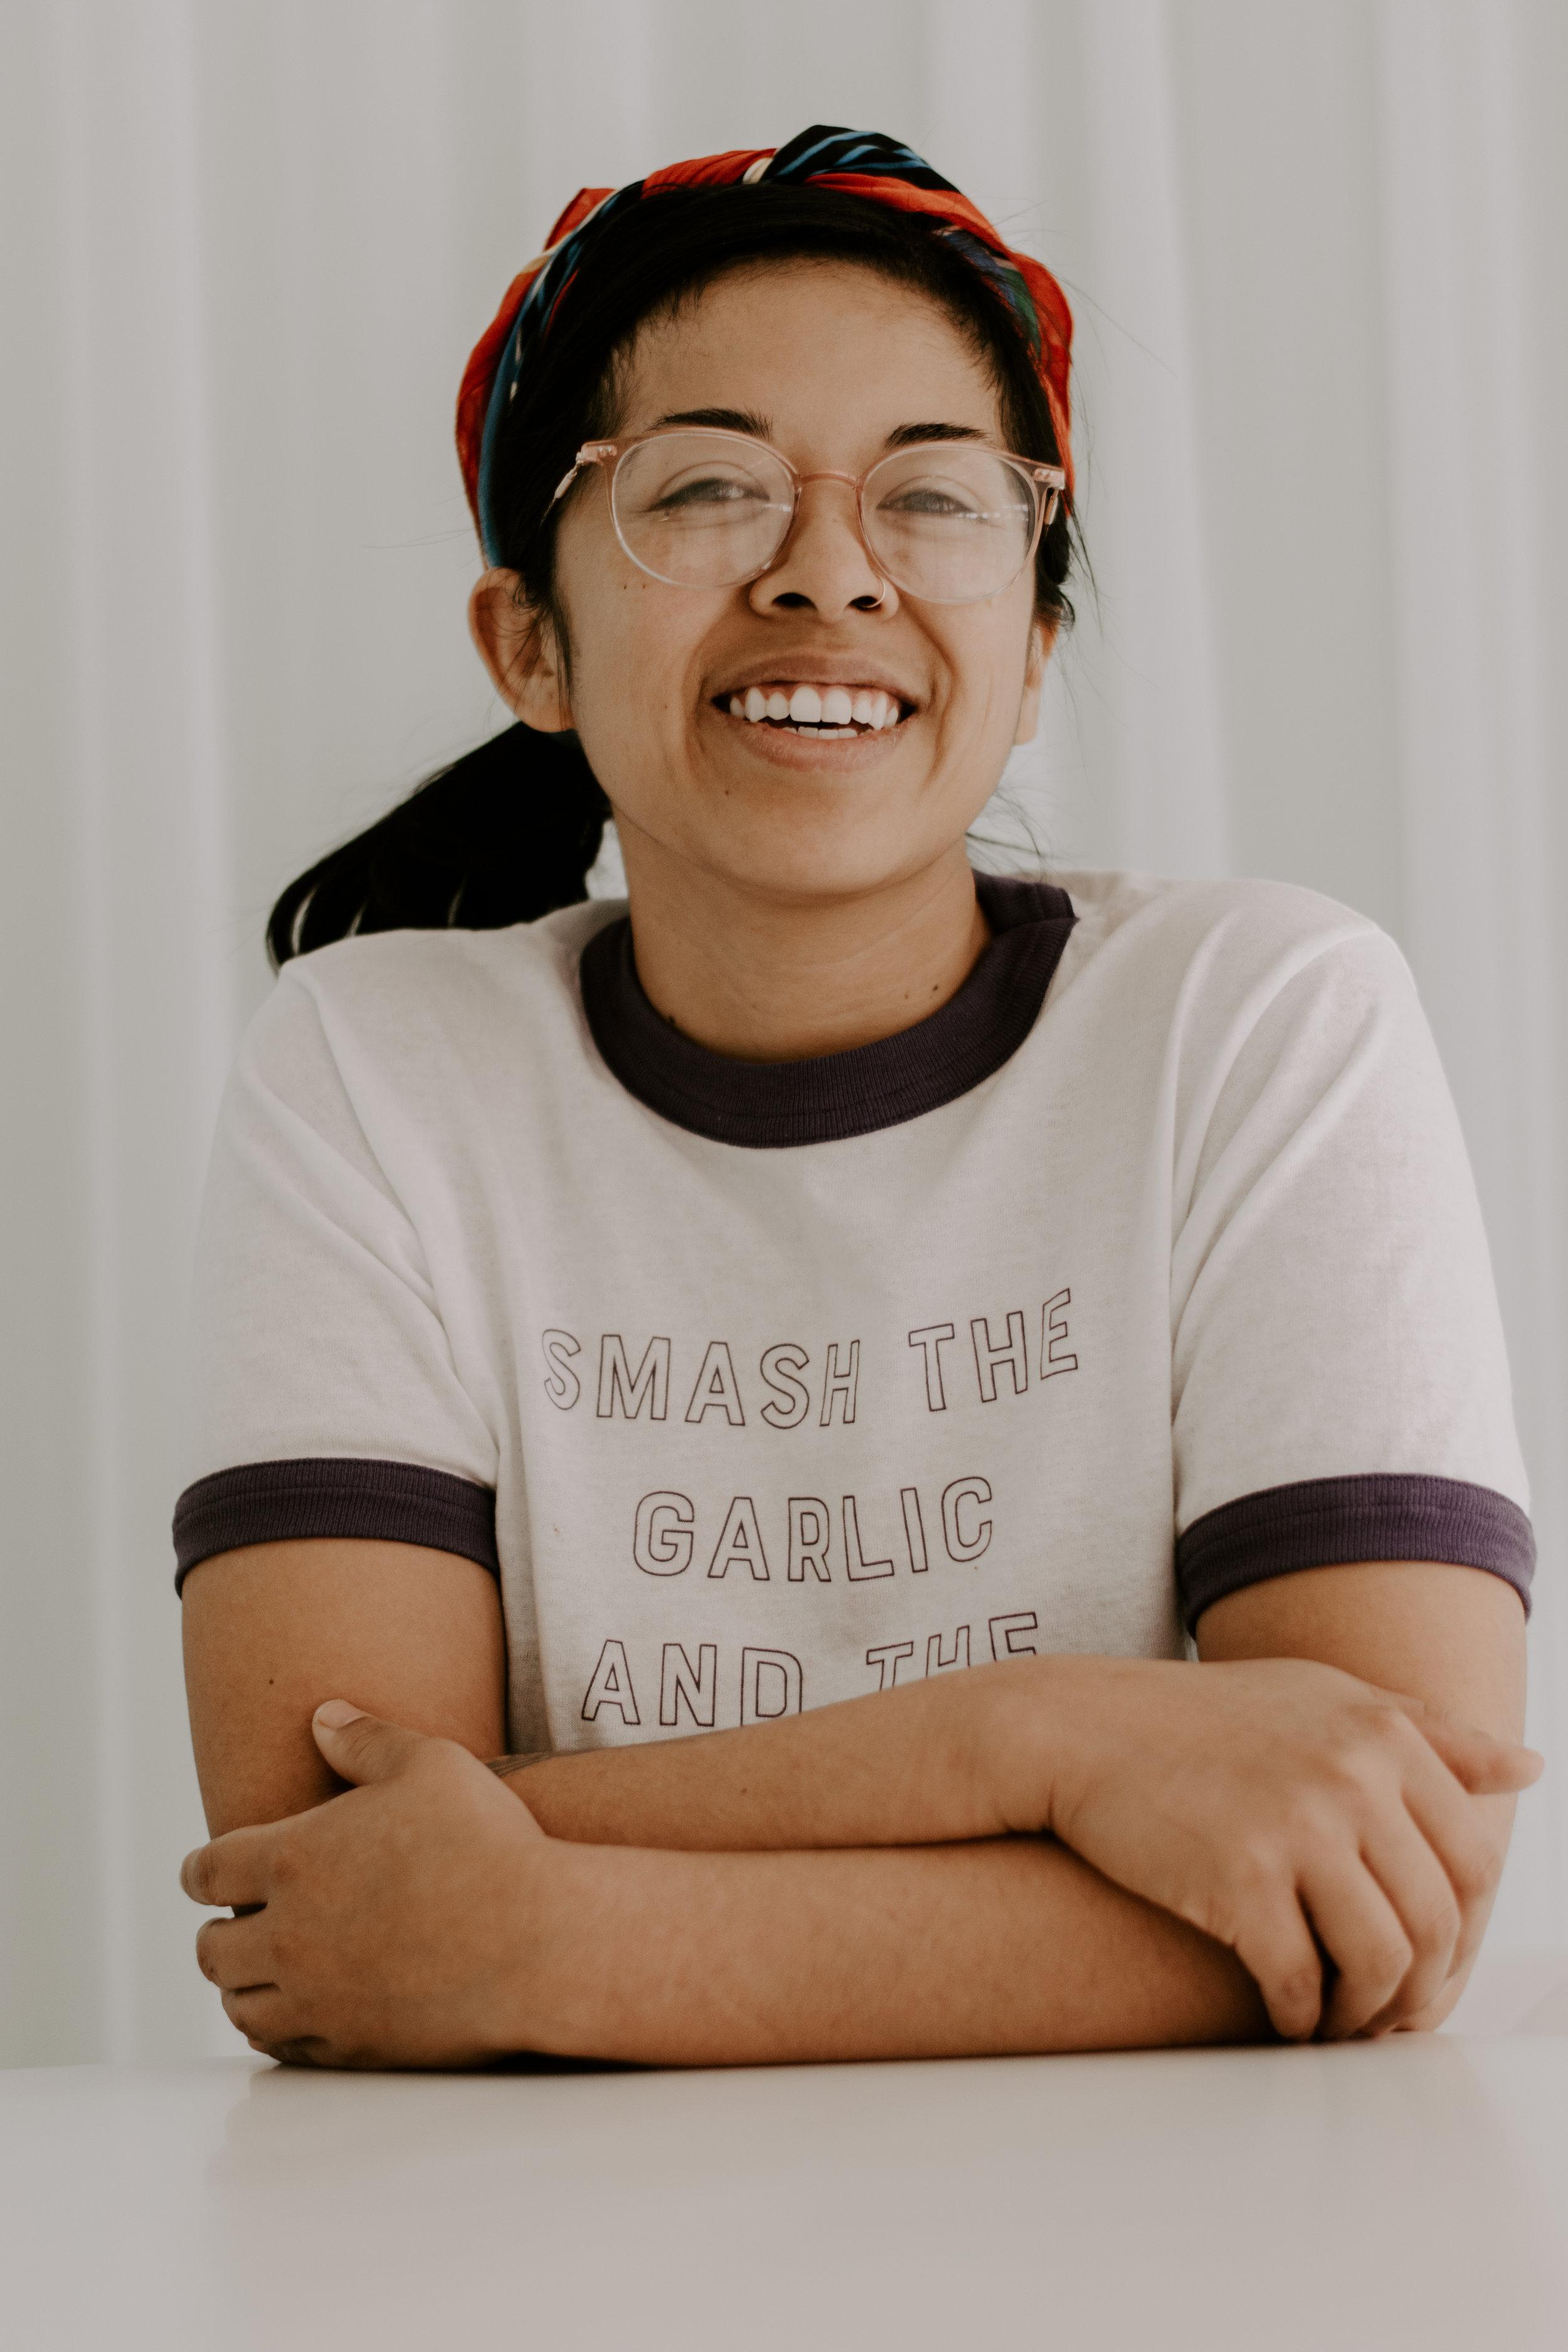 Ellie Tiglao, photographed by Sarah Hummel